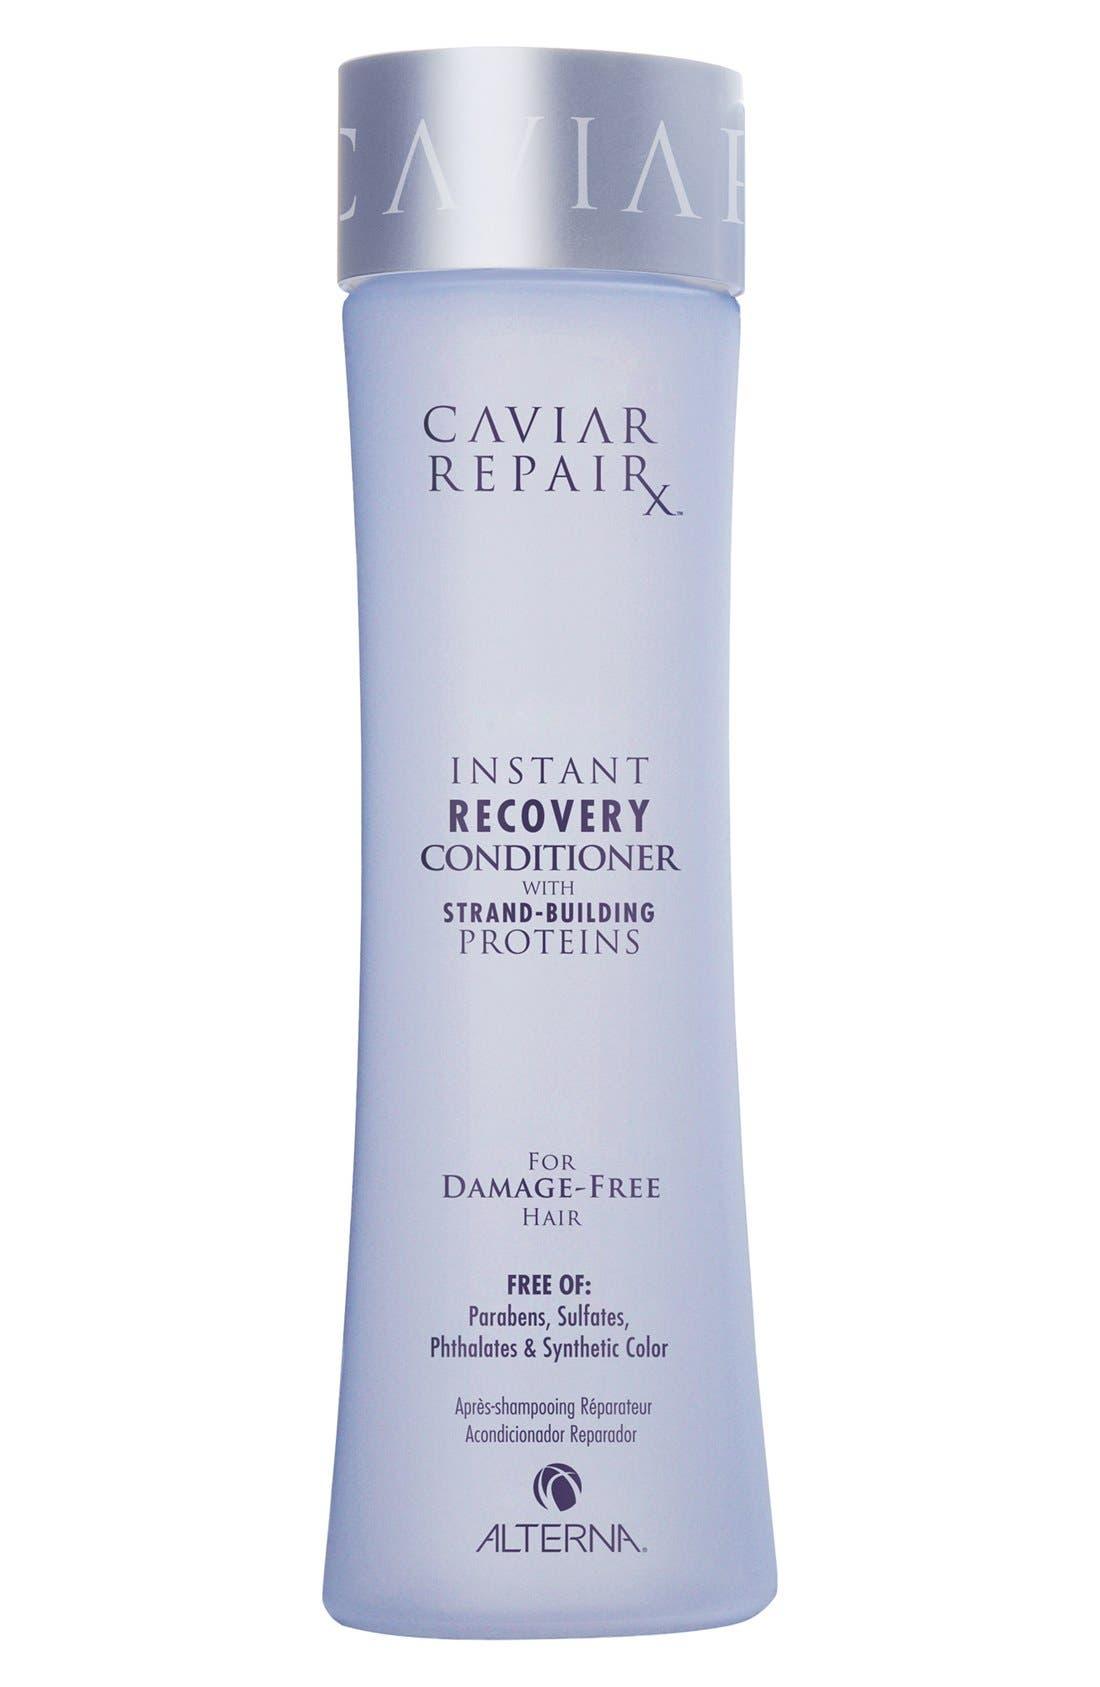 ALTERNA® Caviar Repair Rx Instant Recovery Conditioner